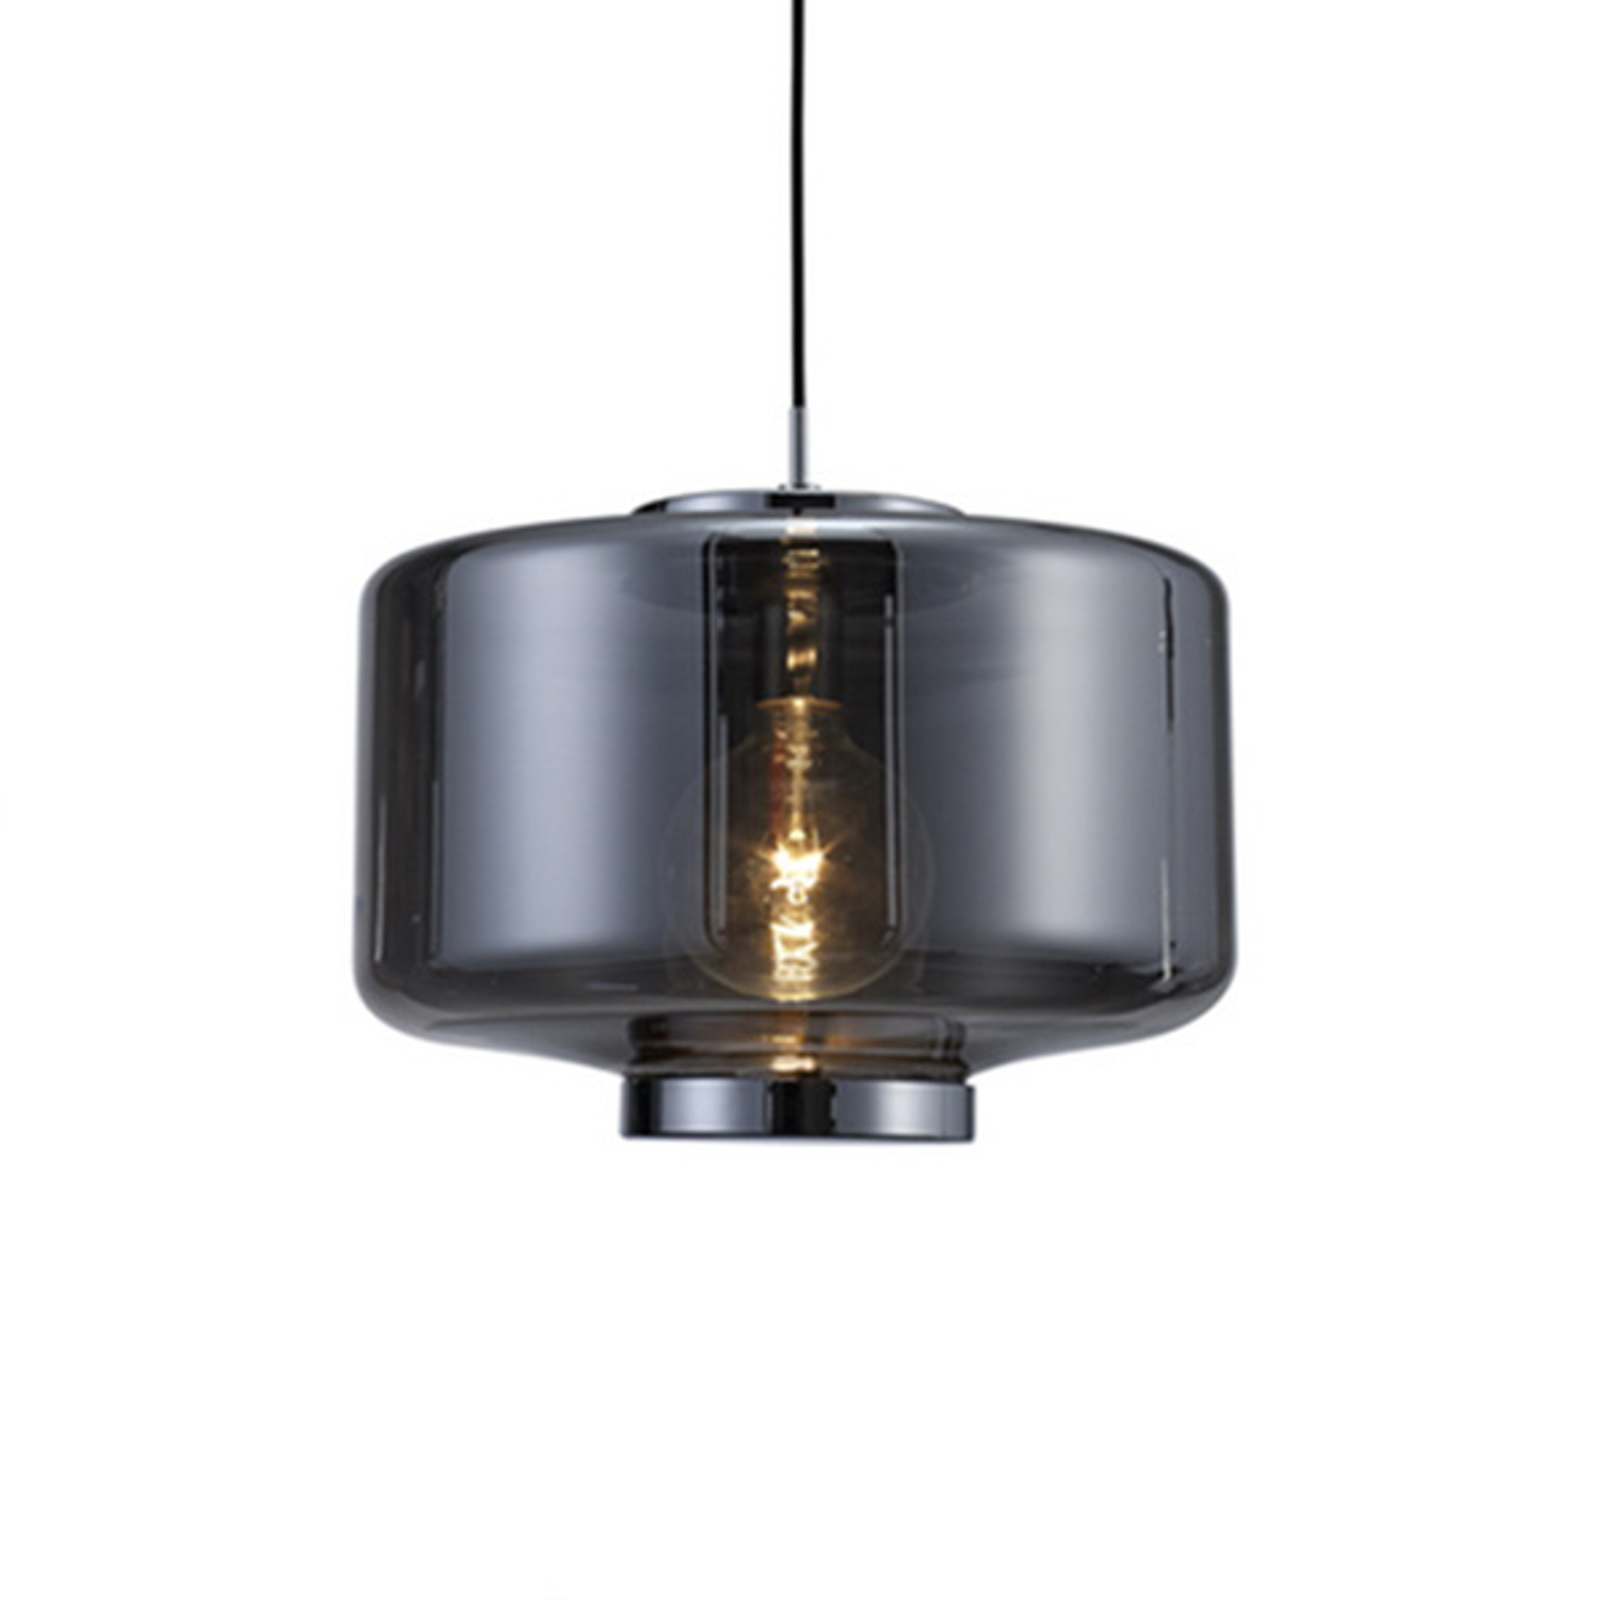 Hanglamp Jarras van glas Ø 40 cm, chroom